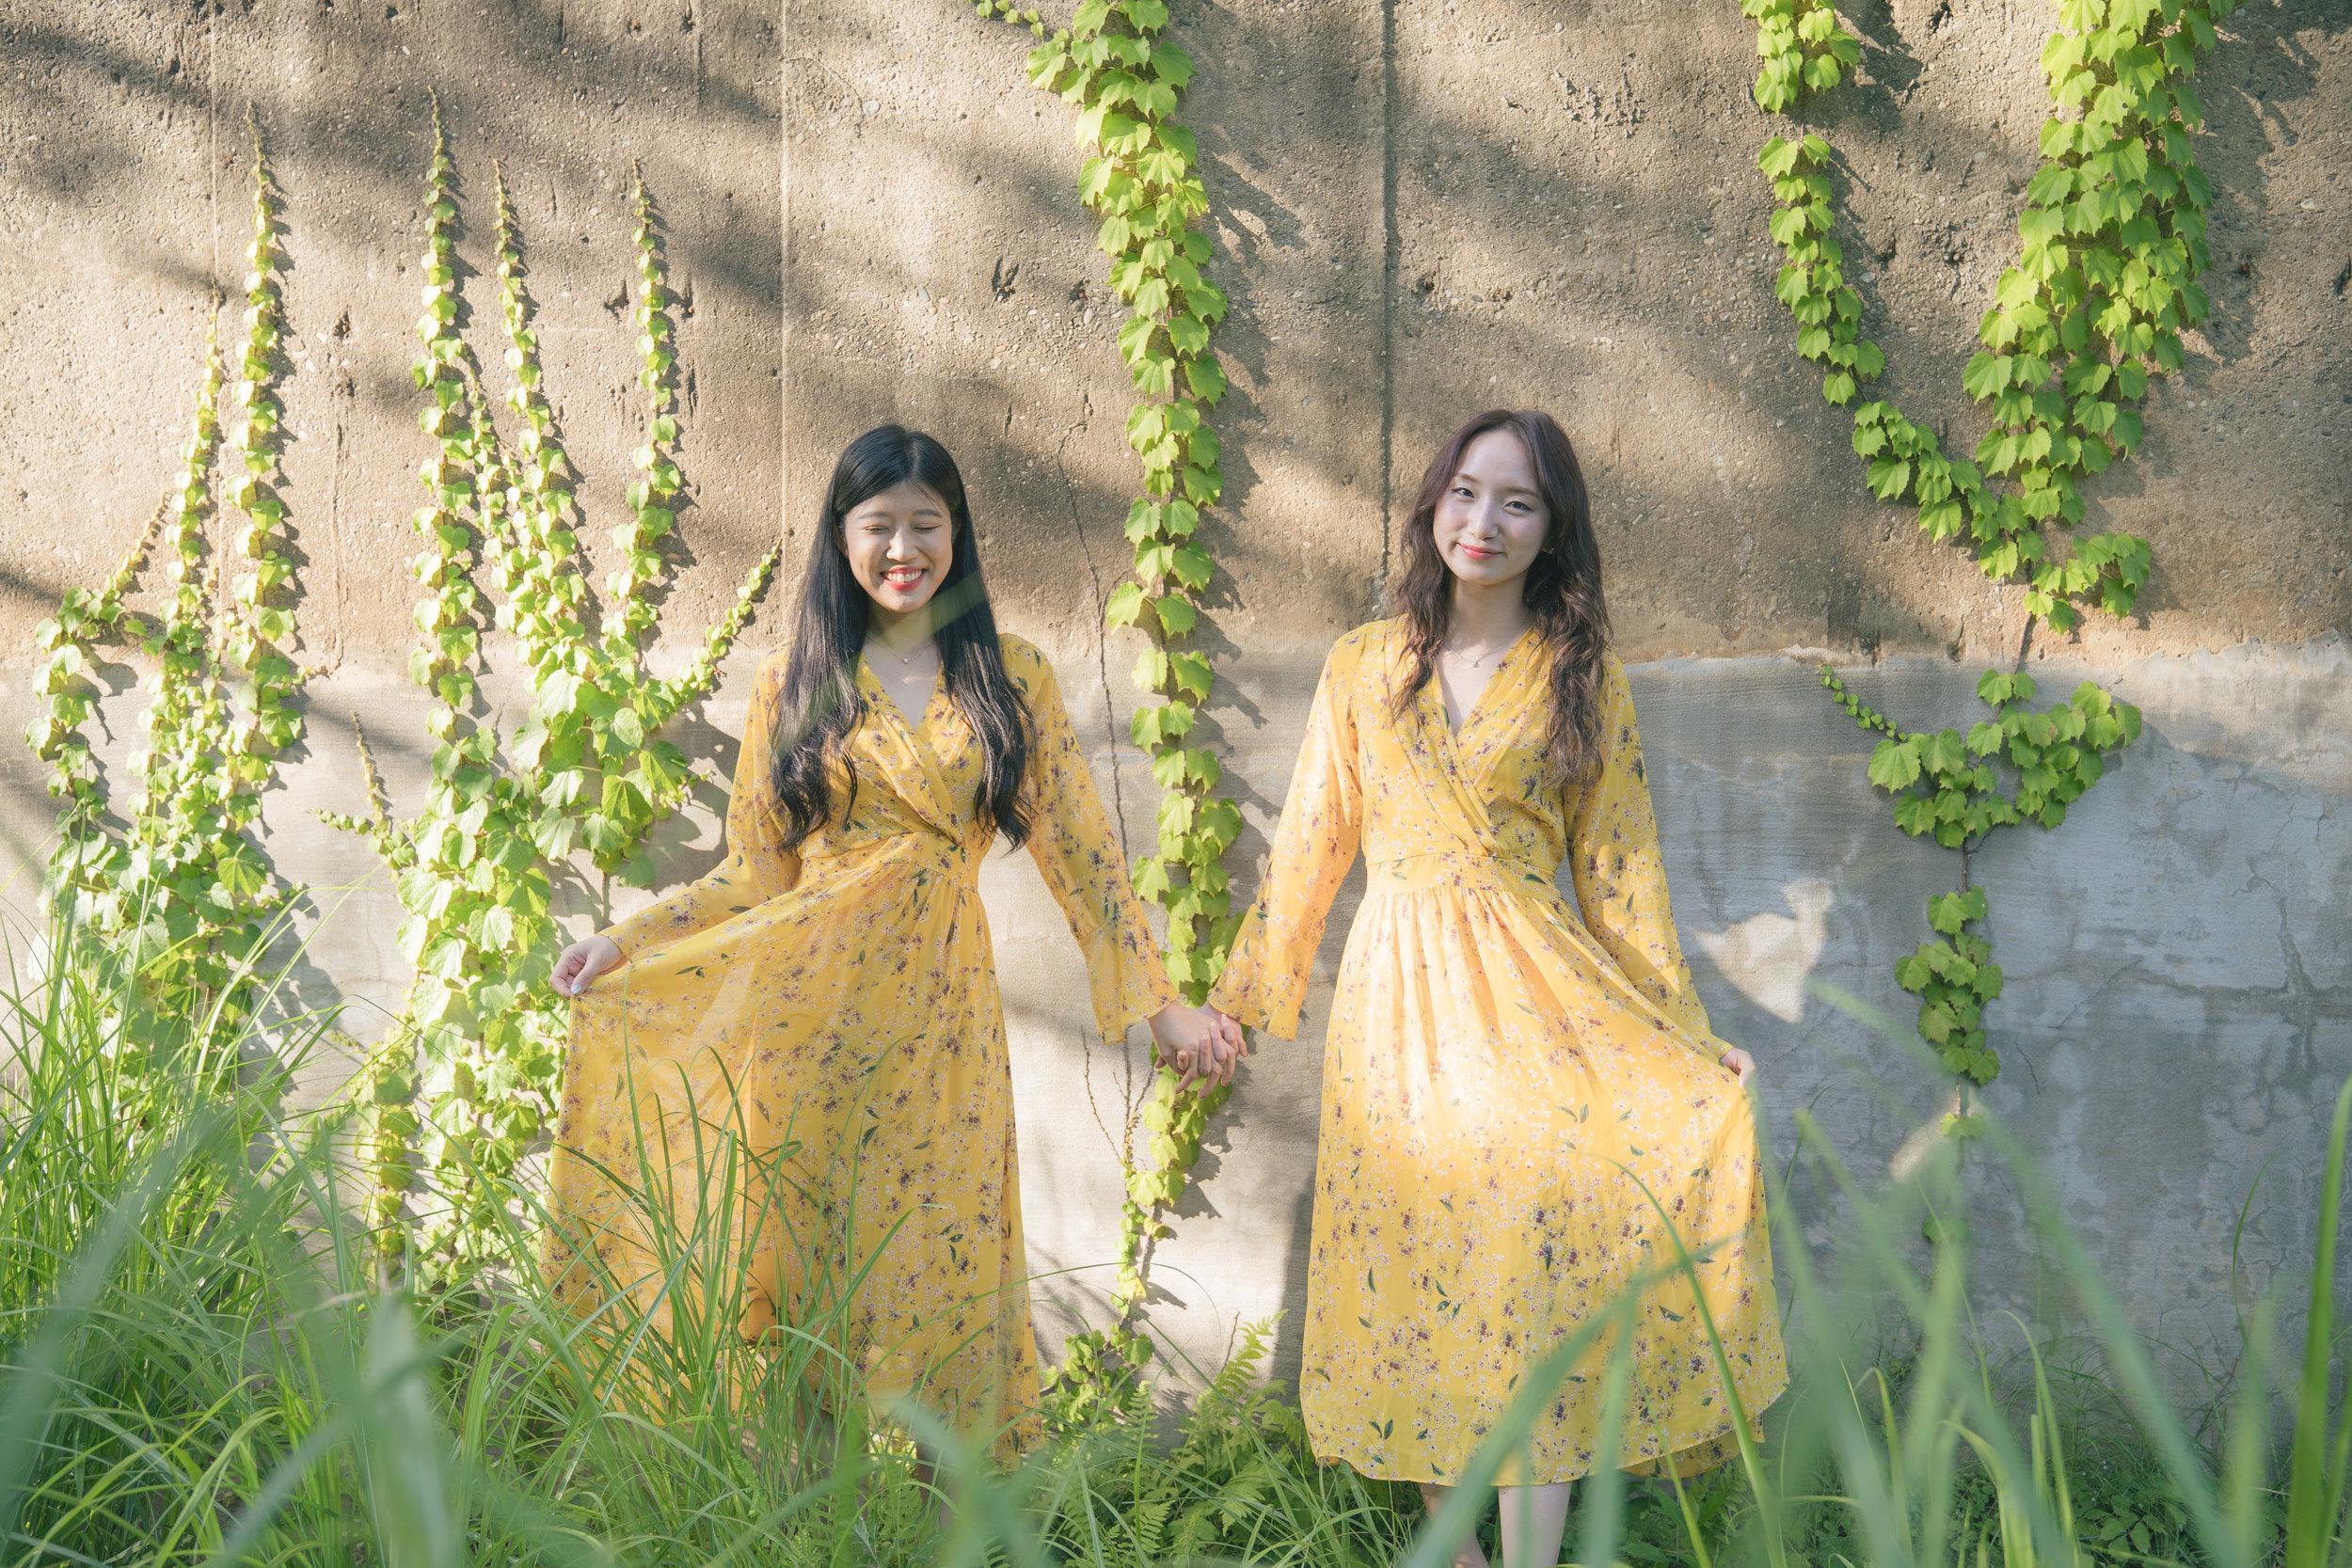 Sprazzi_Professional_Photography_Photographer_Seoul_Korea_Sion_Original_64.jpg